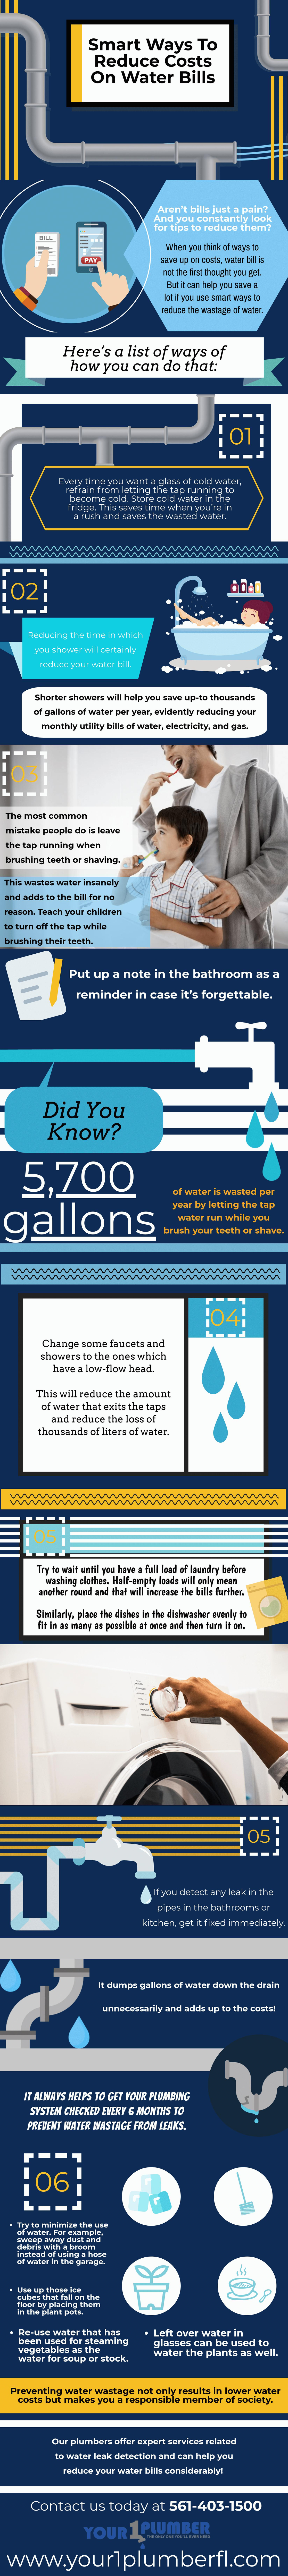 water-bills-smart-ways-to-reduce-costs